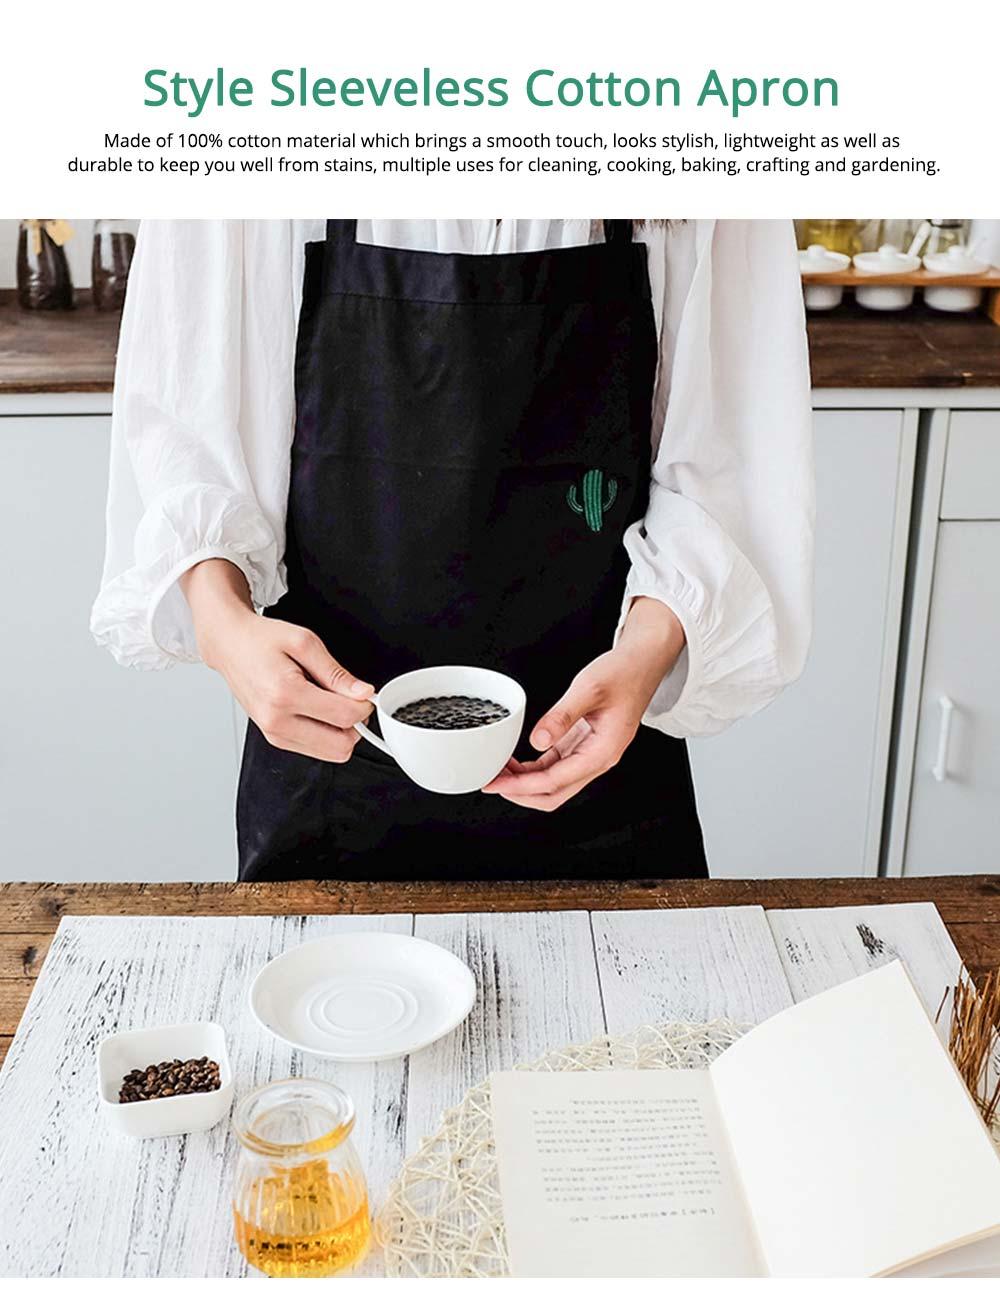 Nordic Style Sleeveless Cotton Apron, Innovative Black Bib for Kitchen & Garden 0